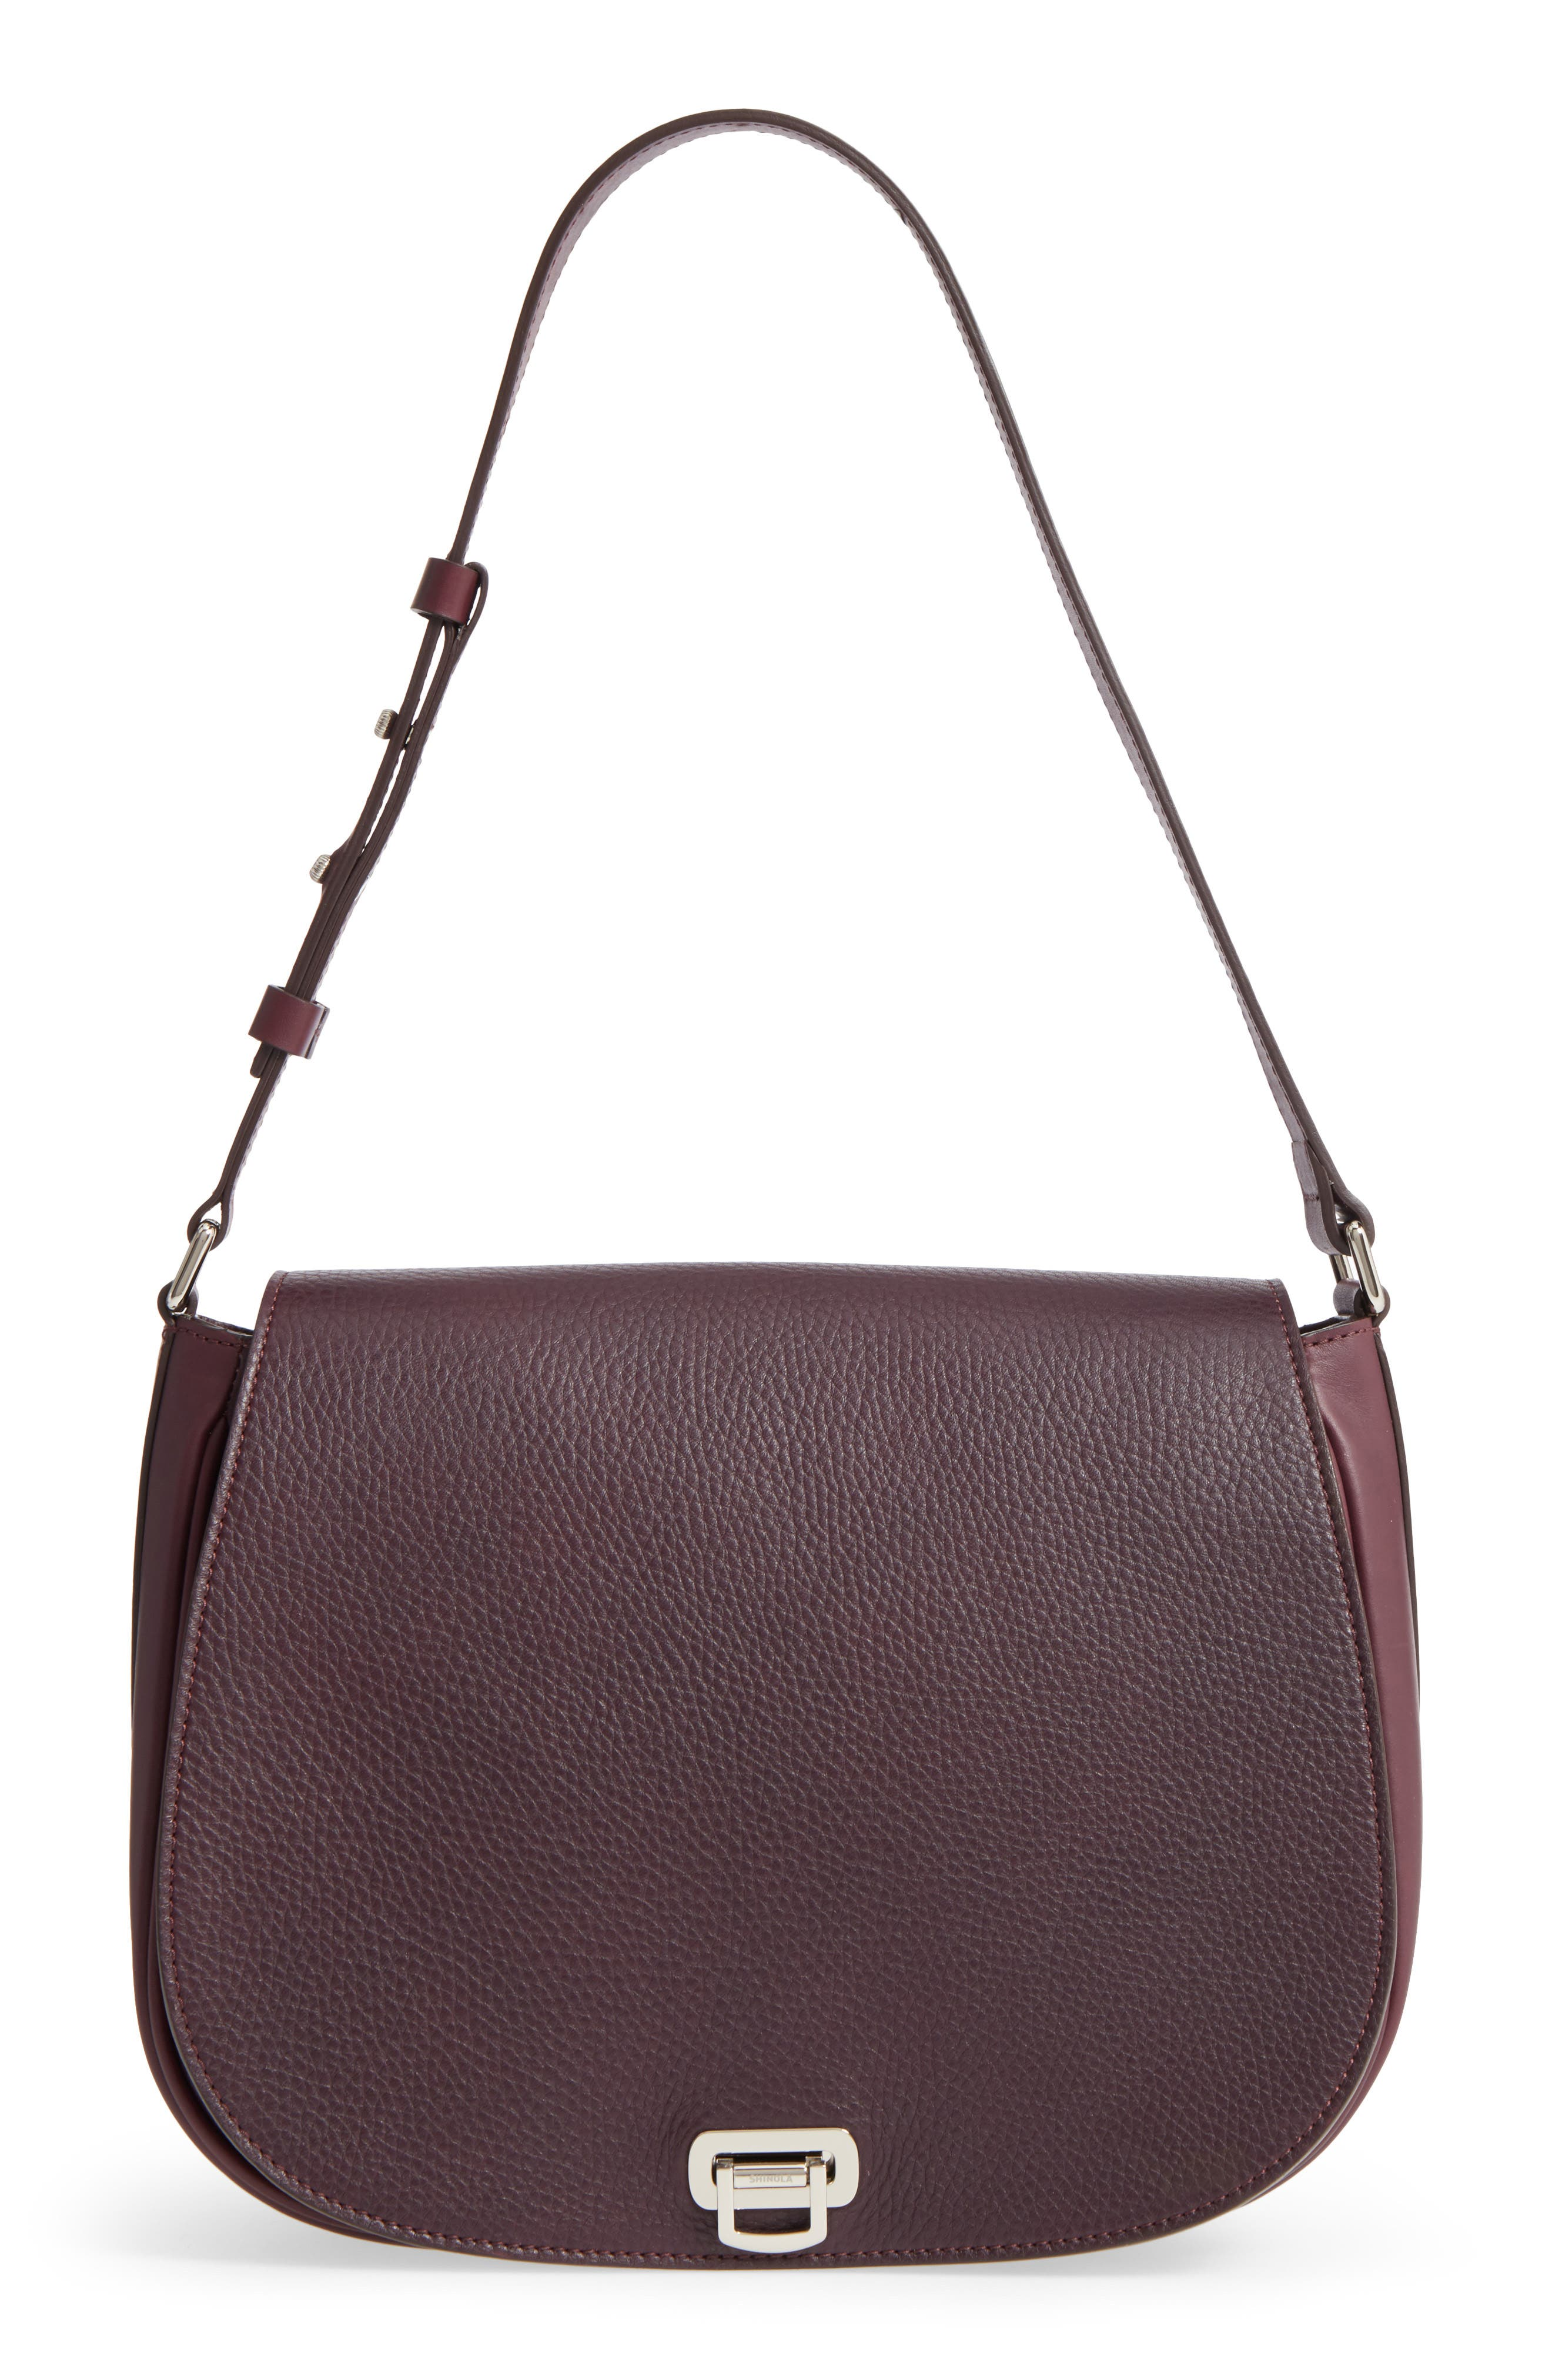 Shinola Calfskin Leather Shoulder Bag